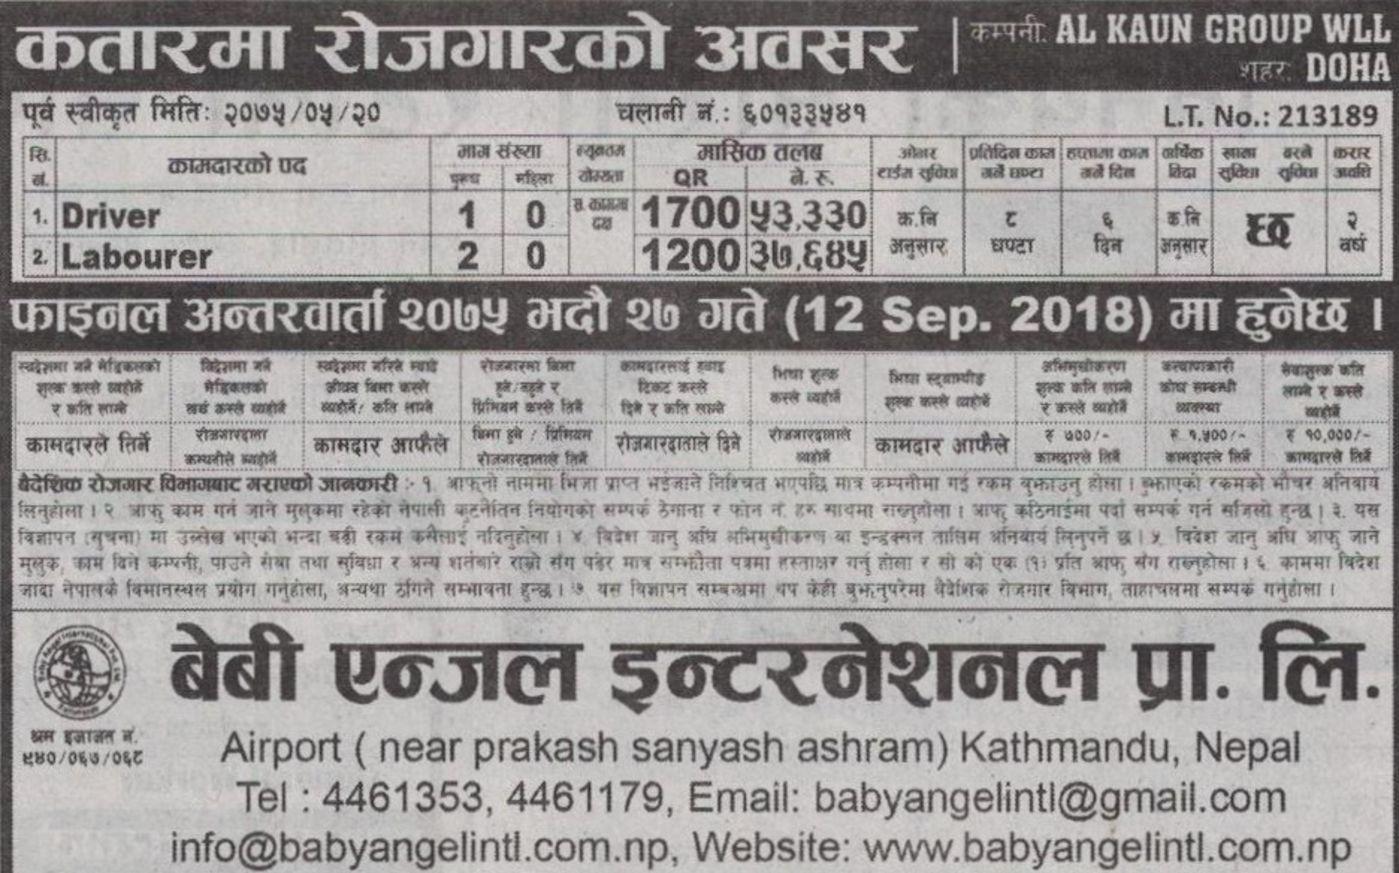 Jobs Nepal - Vacancy - Driver, Laborer - Al Kaun Group WLL - Qatar